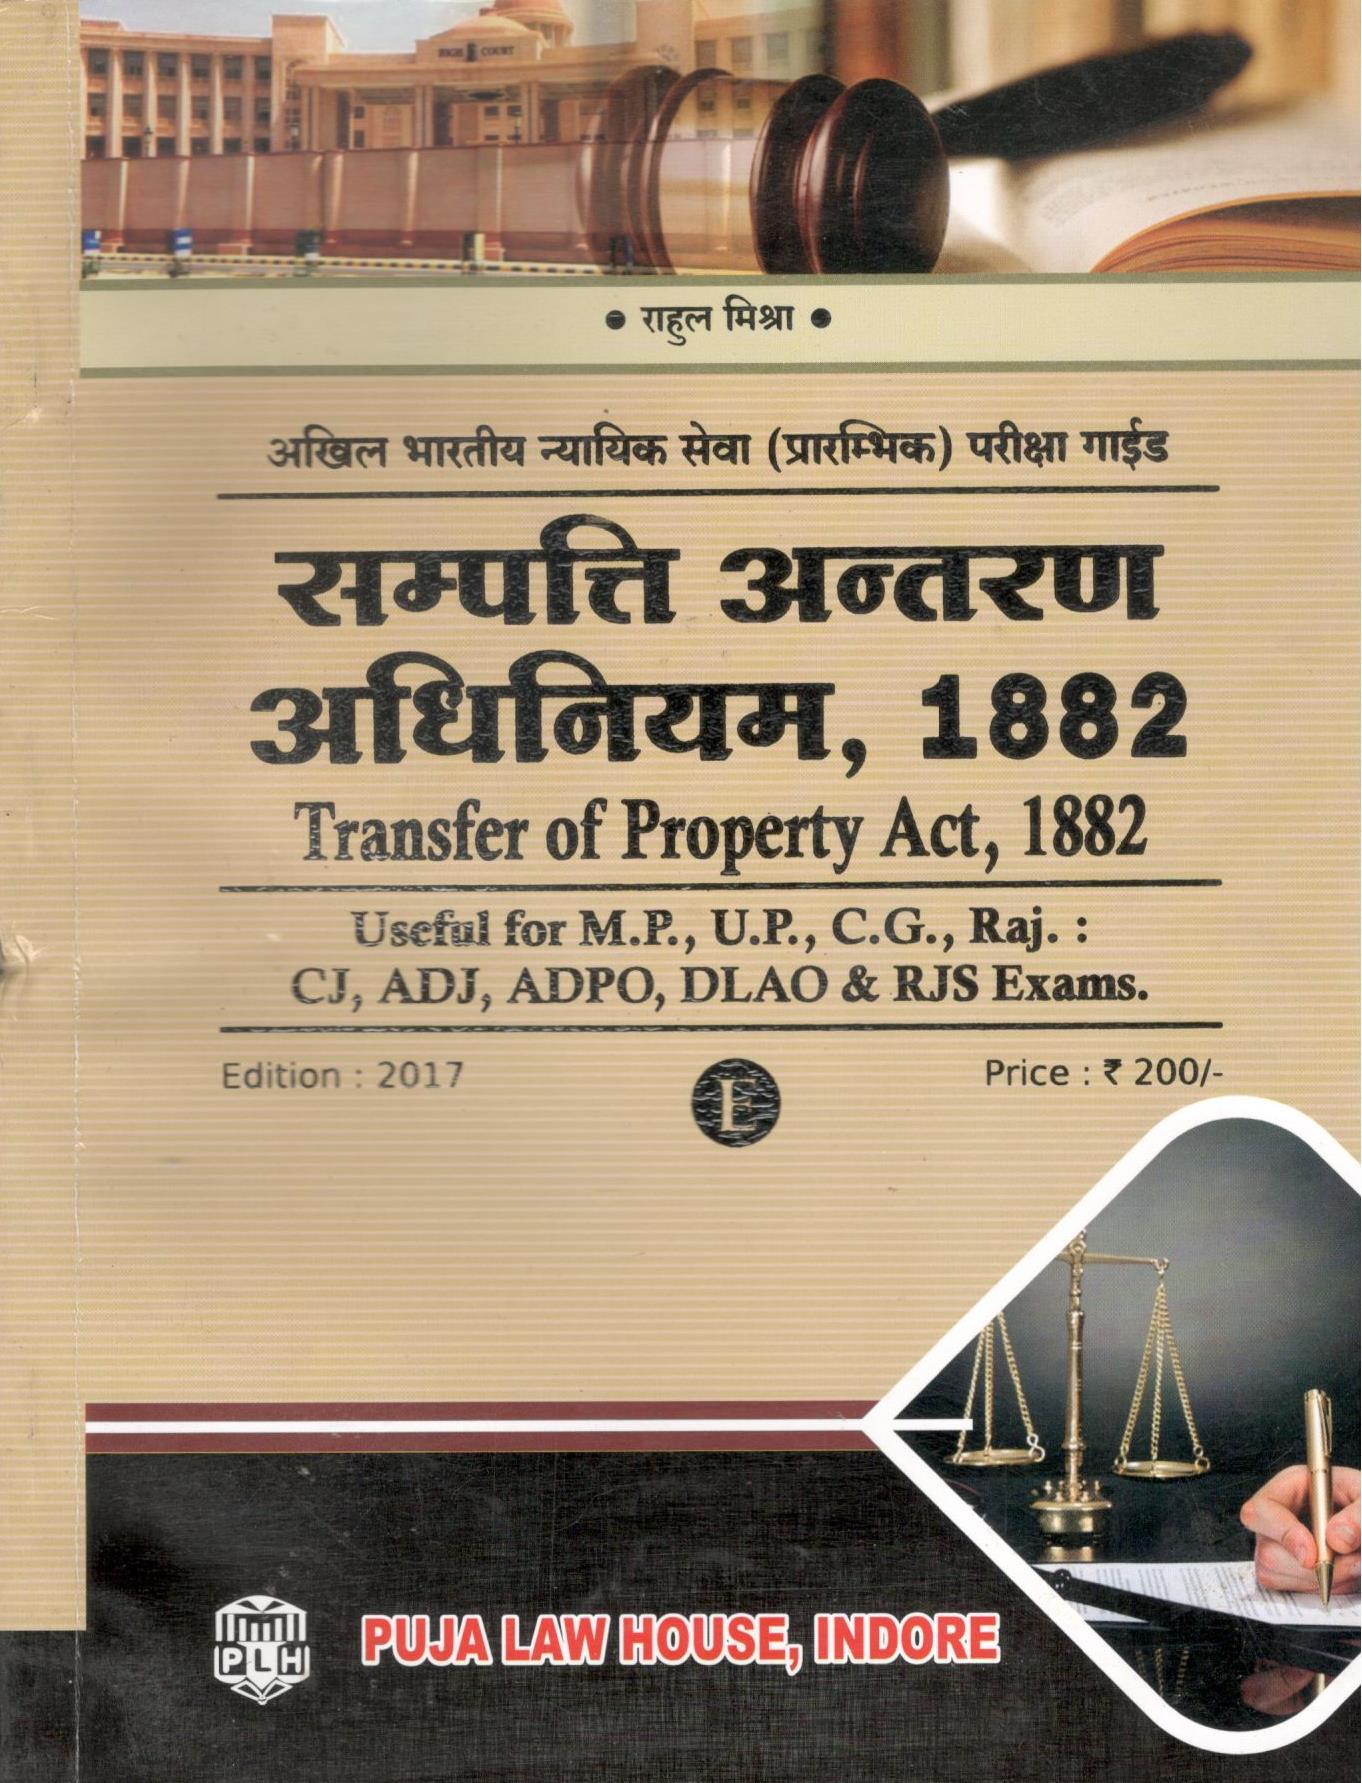 Buy राह�ल मिश�रा - संपत�ति-अंतरण अधिनियम (अखिल भारतीय न�यायिक सेवा और सिविल परीक�षा सीरीज E) / Transfer of Property Act, 1882 (All India Judicial Services & Civil Exam Series E)